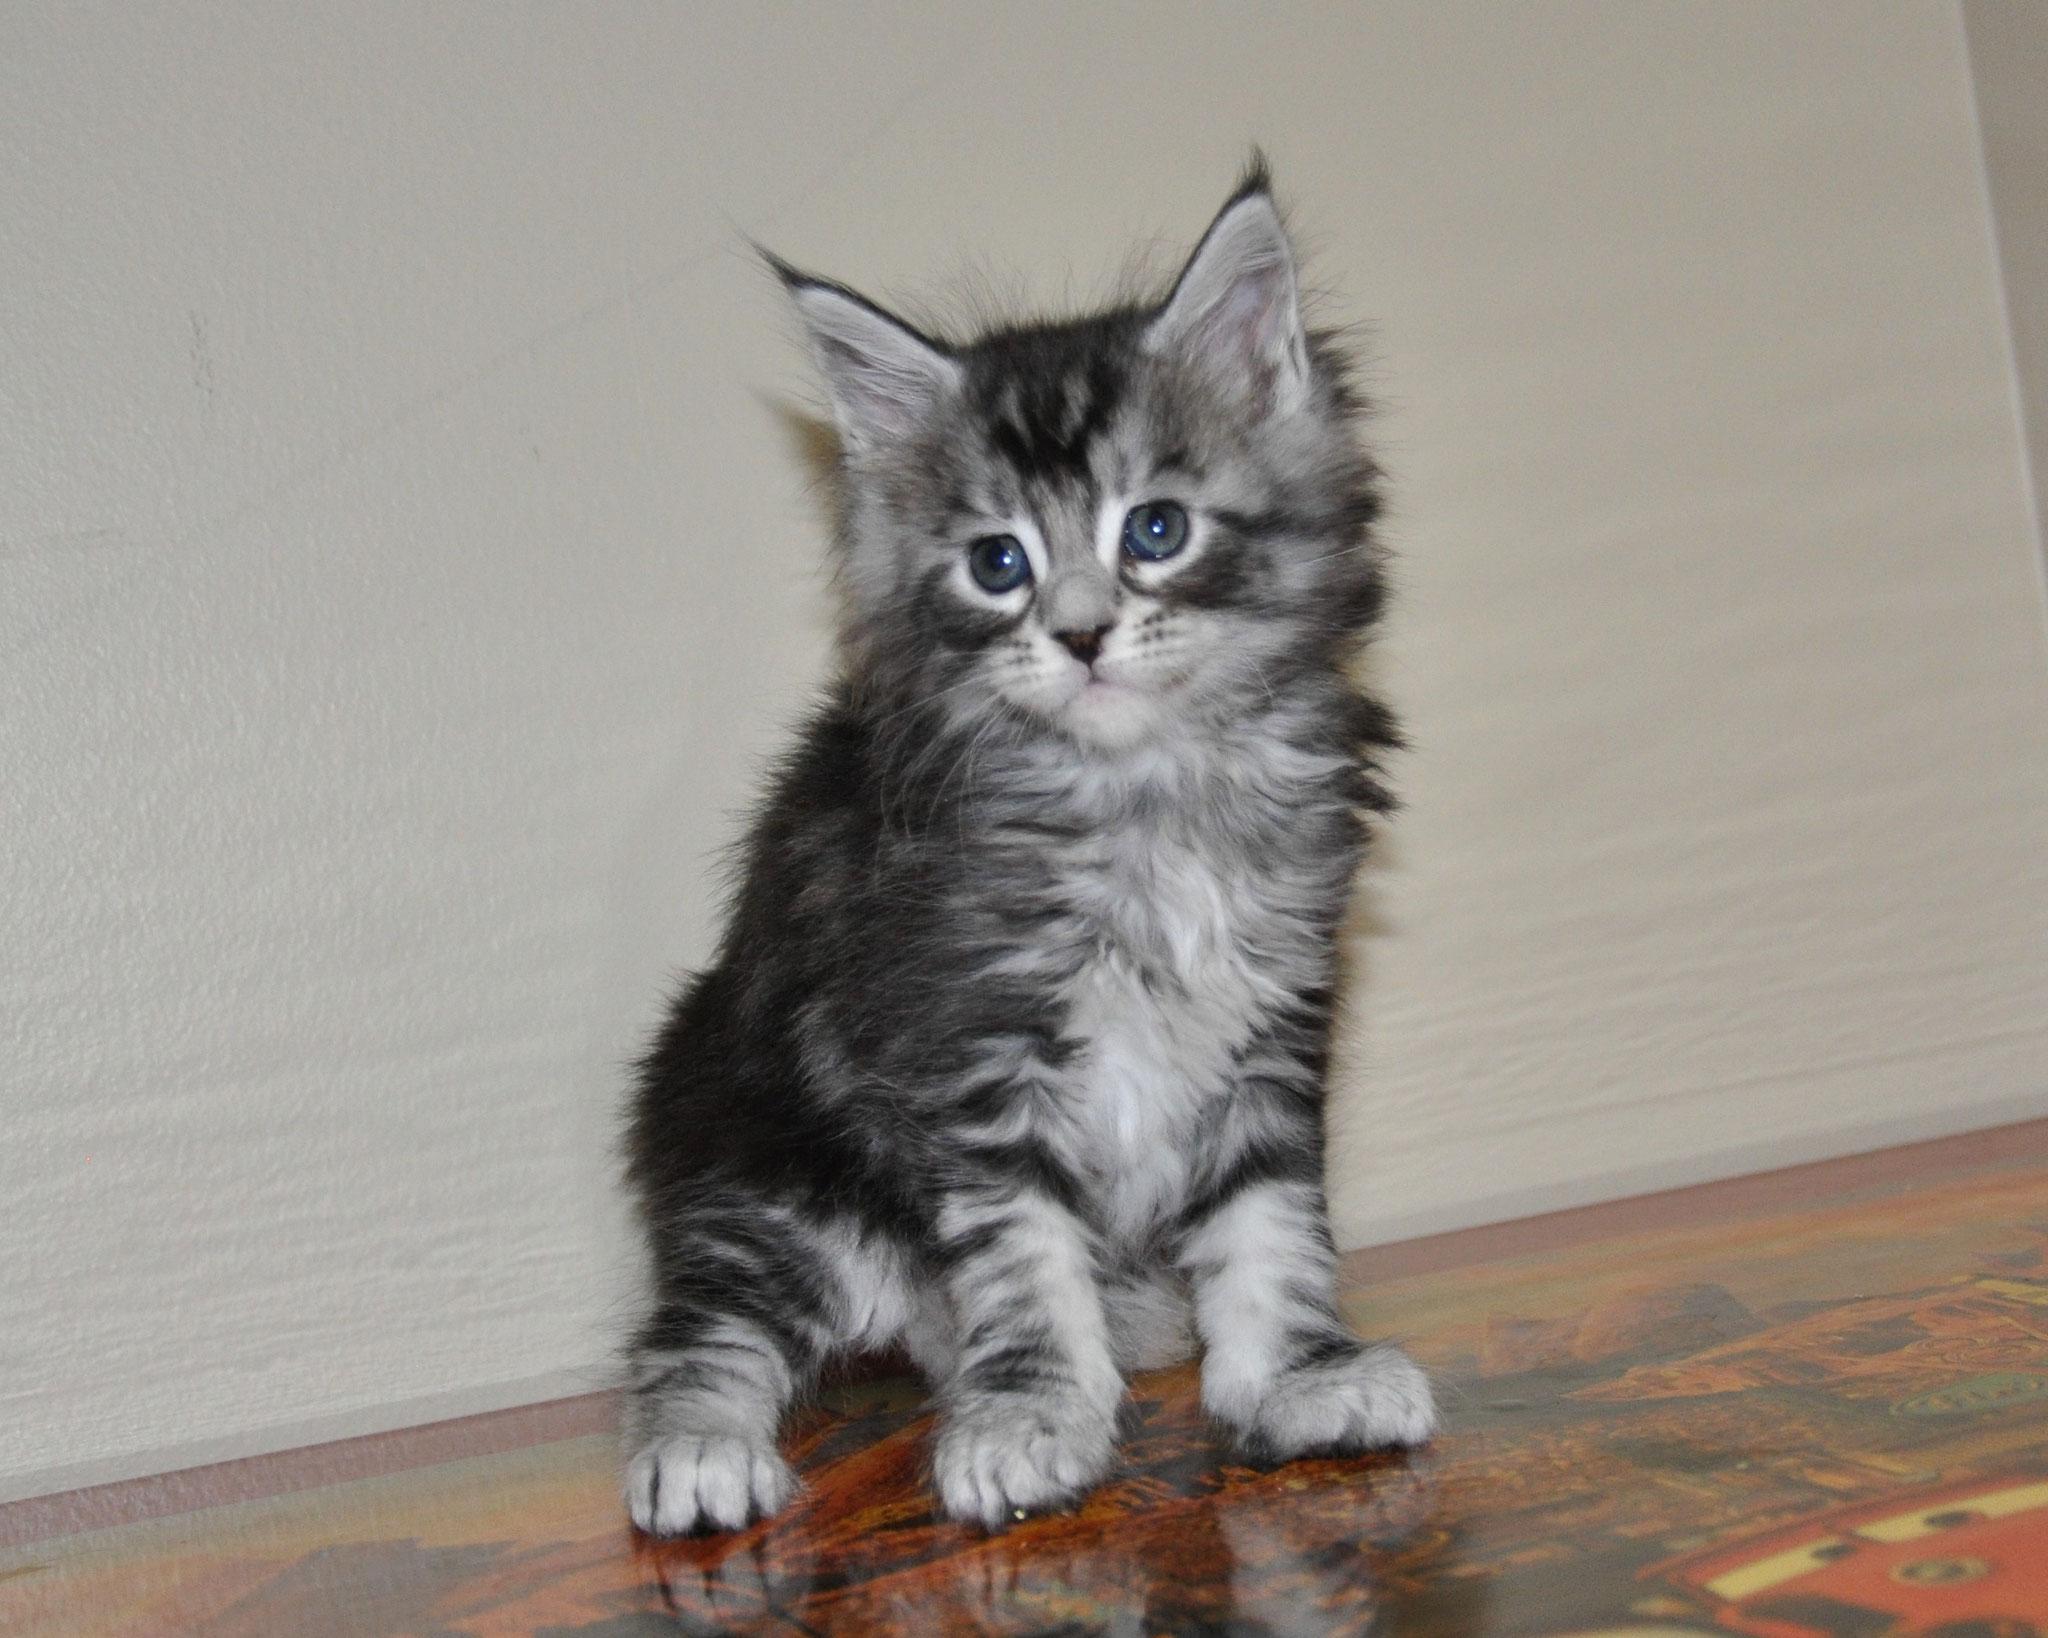 Eva, 5 weeks